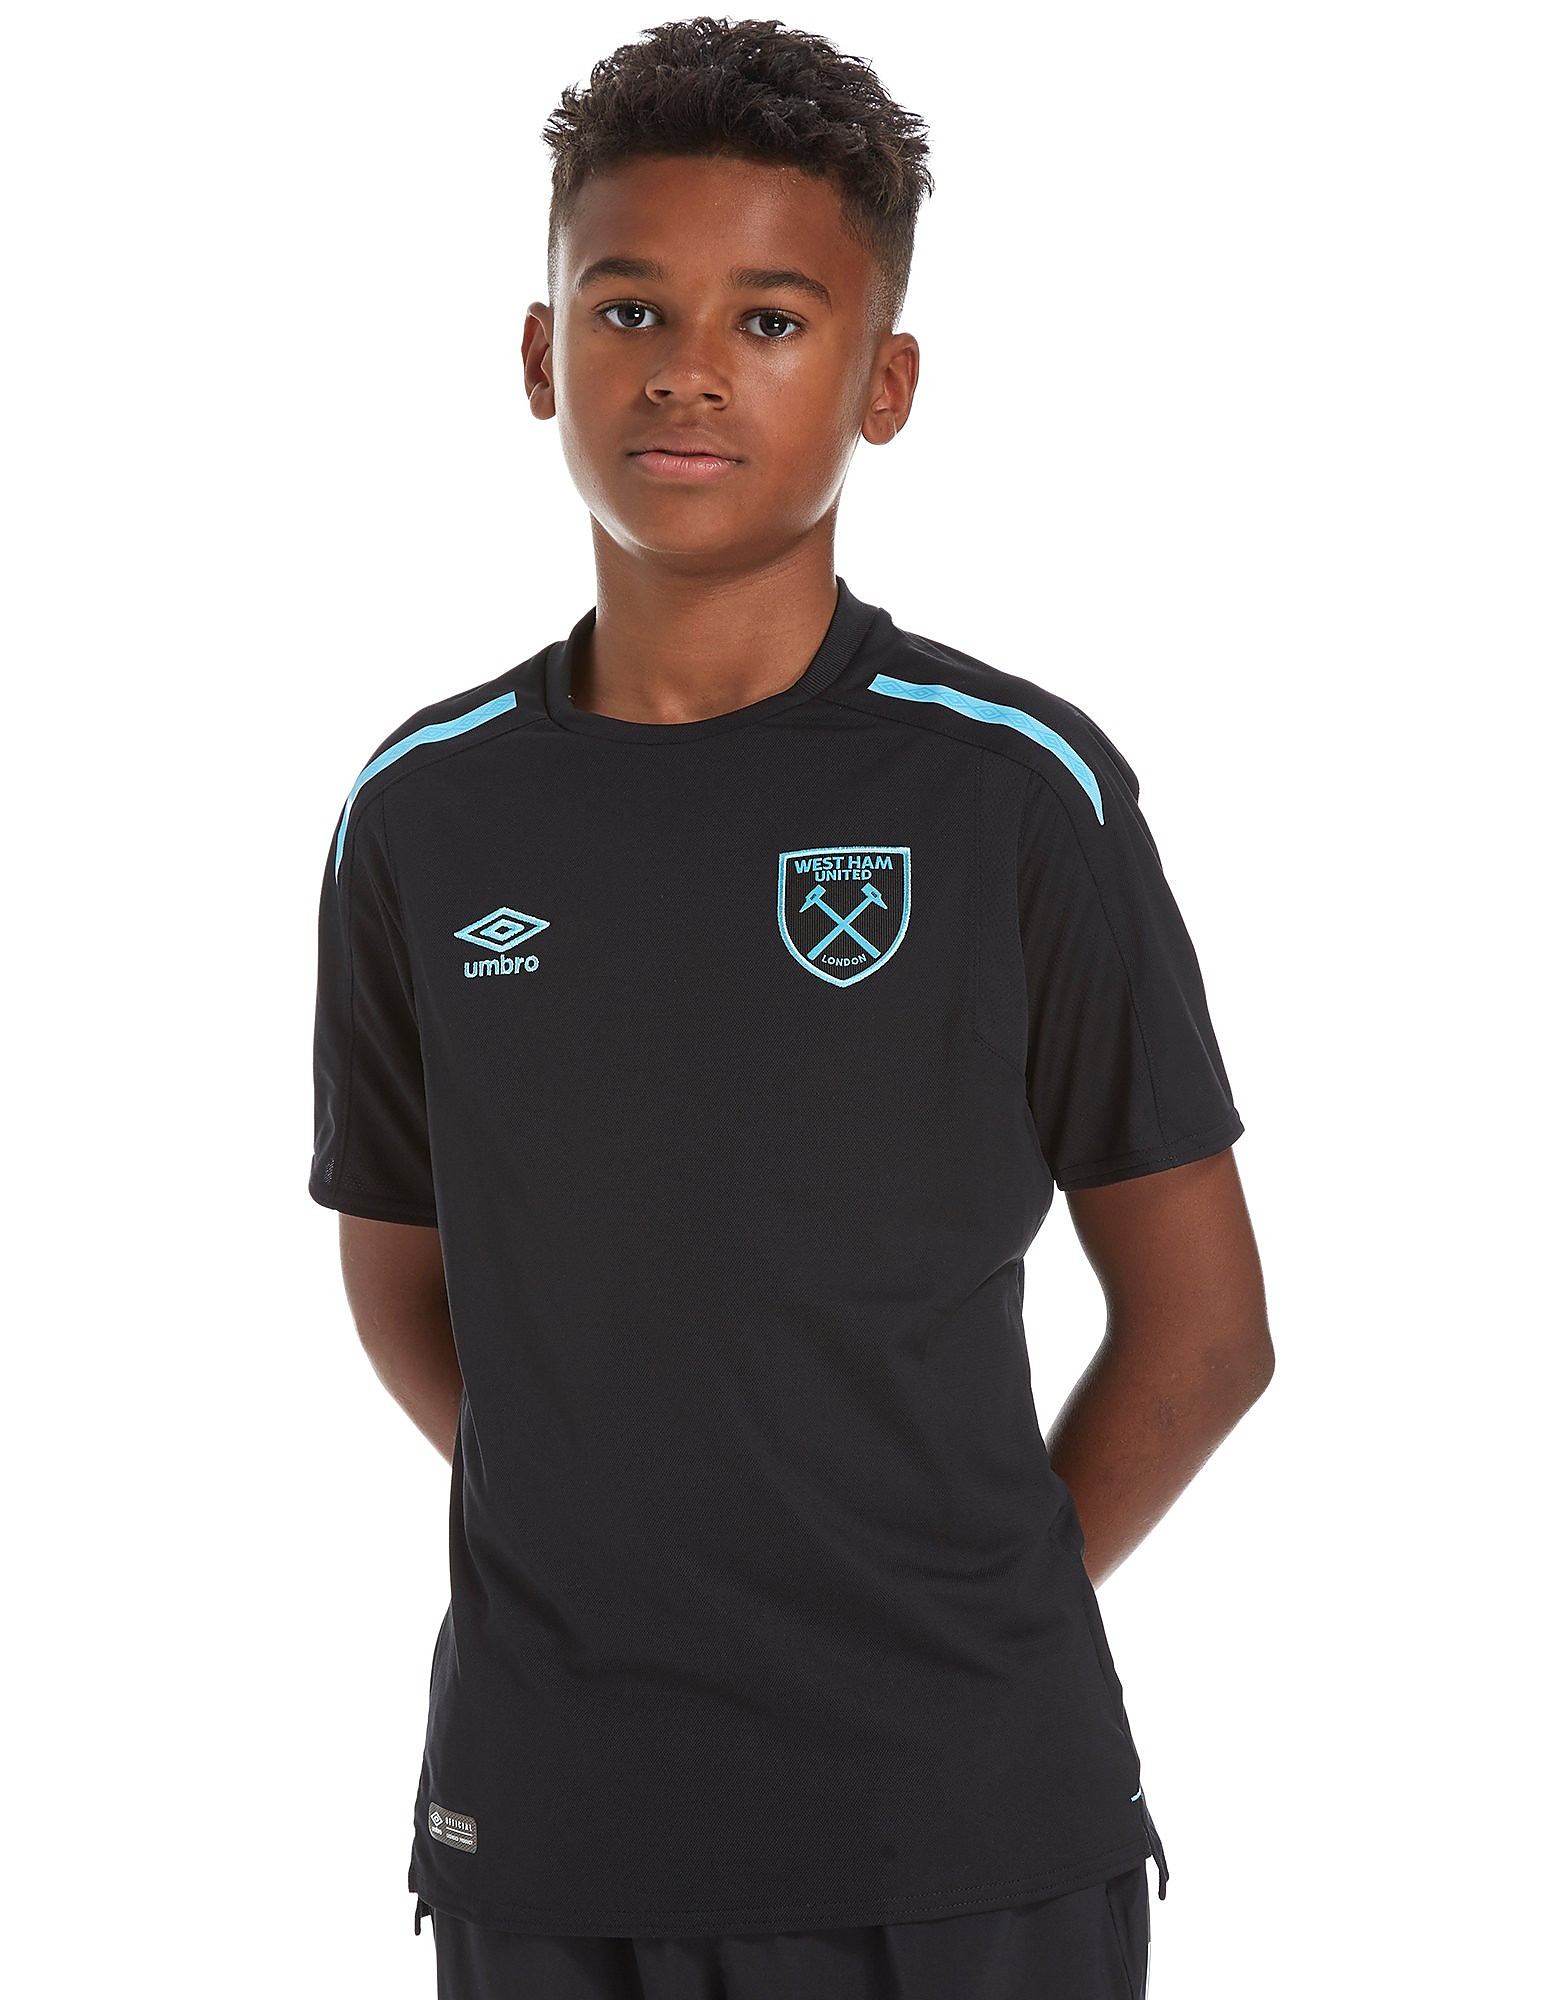 Umbro West Ham Utd 2017/18 Away Shirt Junior PRE ORDER